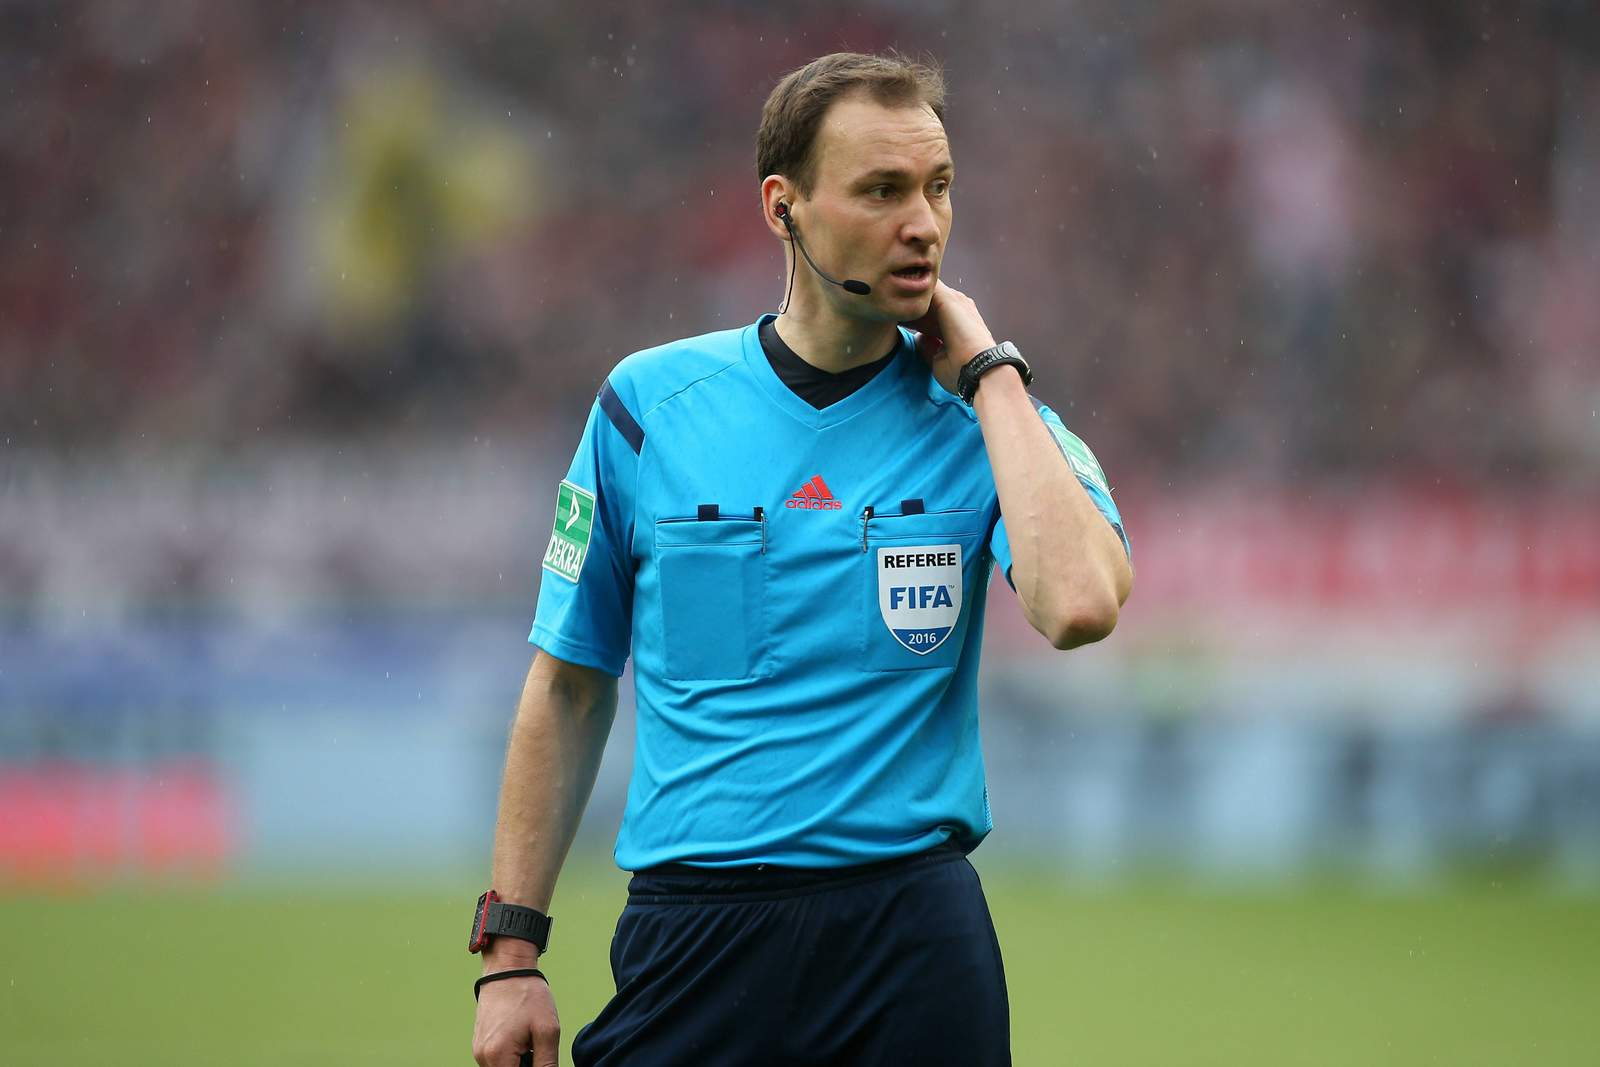 Bastian Dankert Schiedsrichter 2. Liga